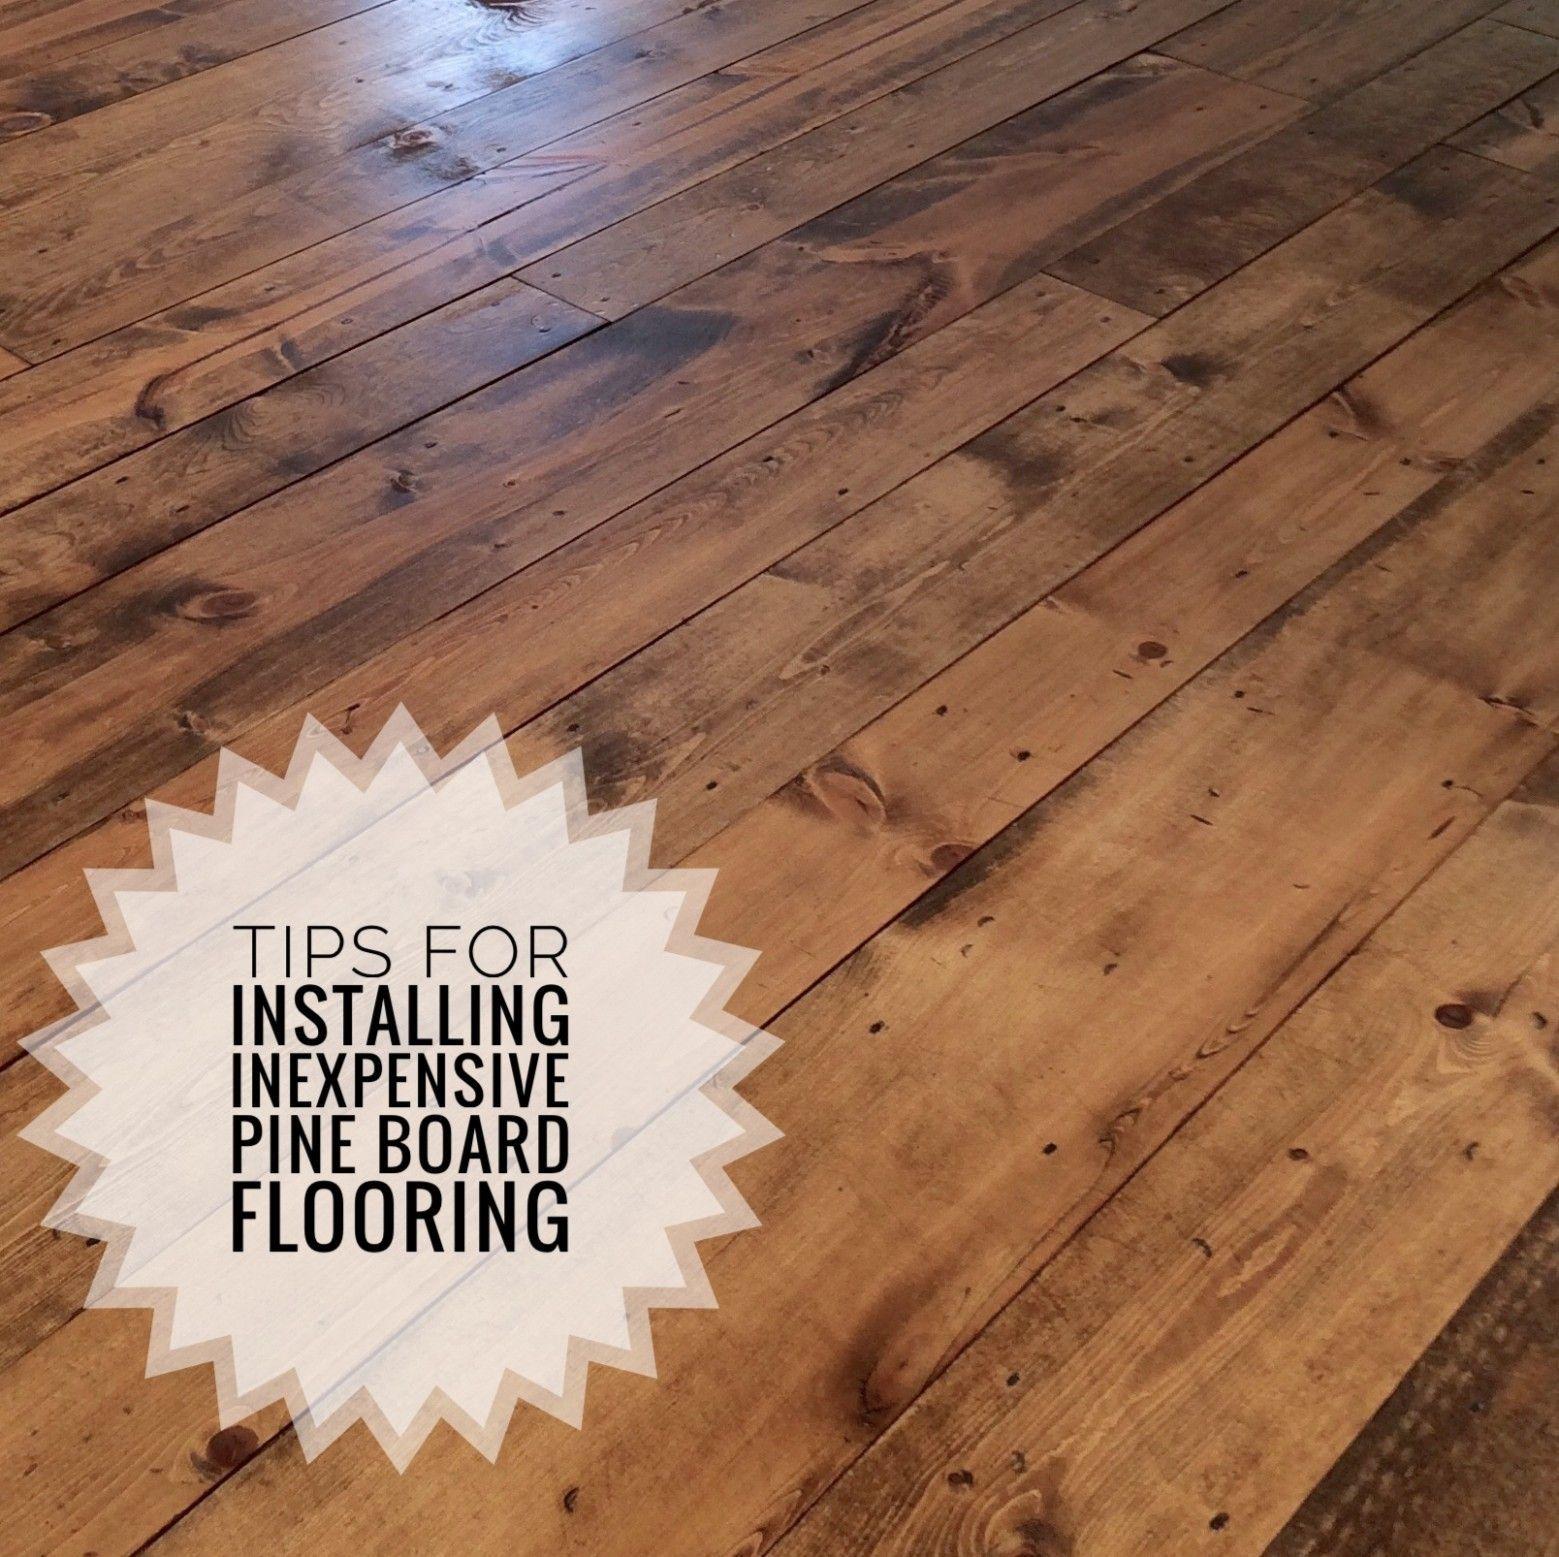 Bathroom Wood Floor Sealant In 2020 Pine Wood Flooring Diy Wood Floors Cheap Wood Flooring